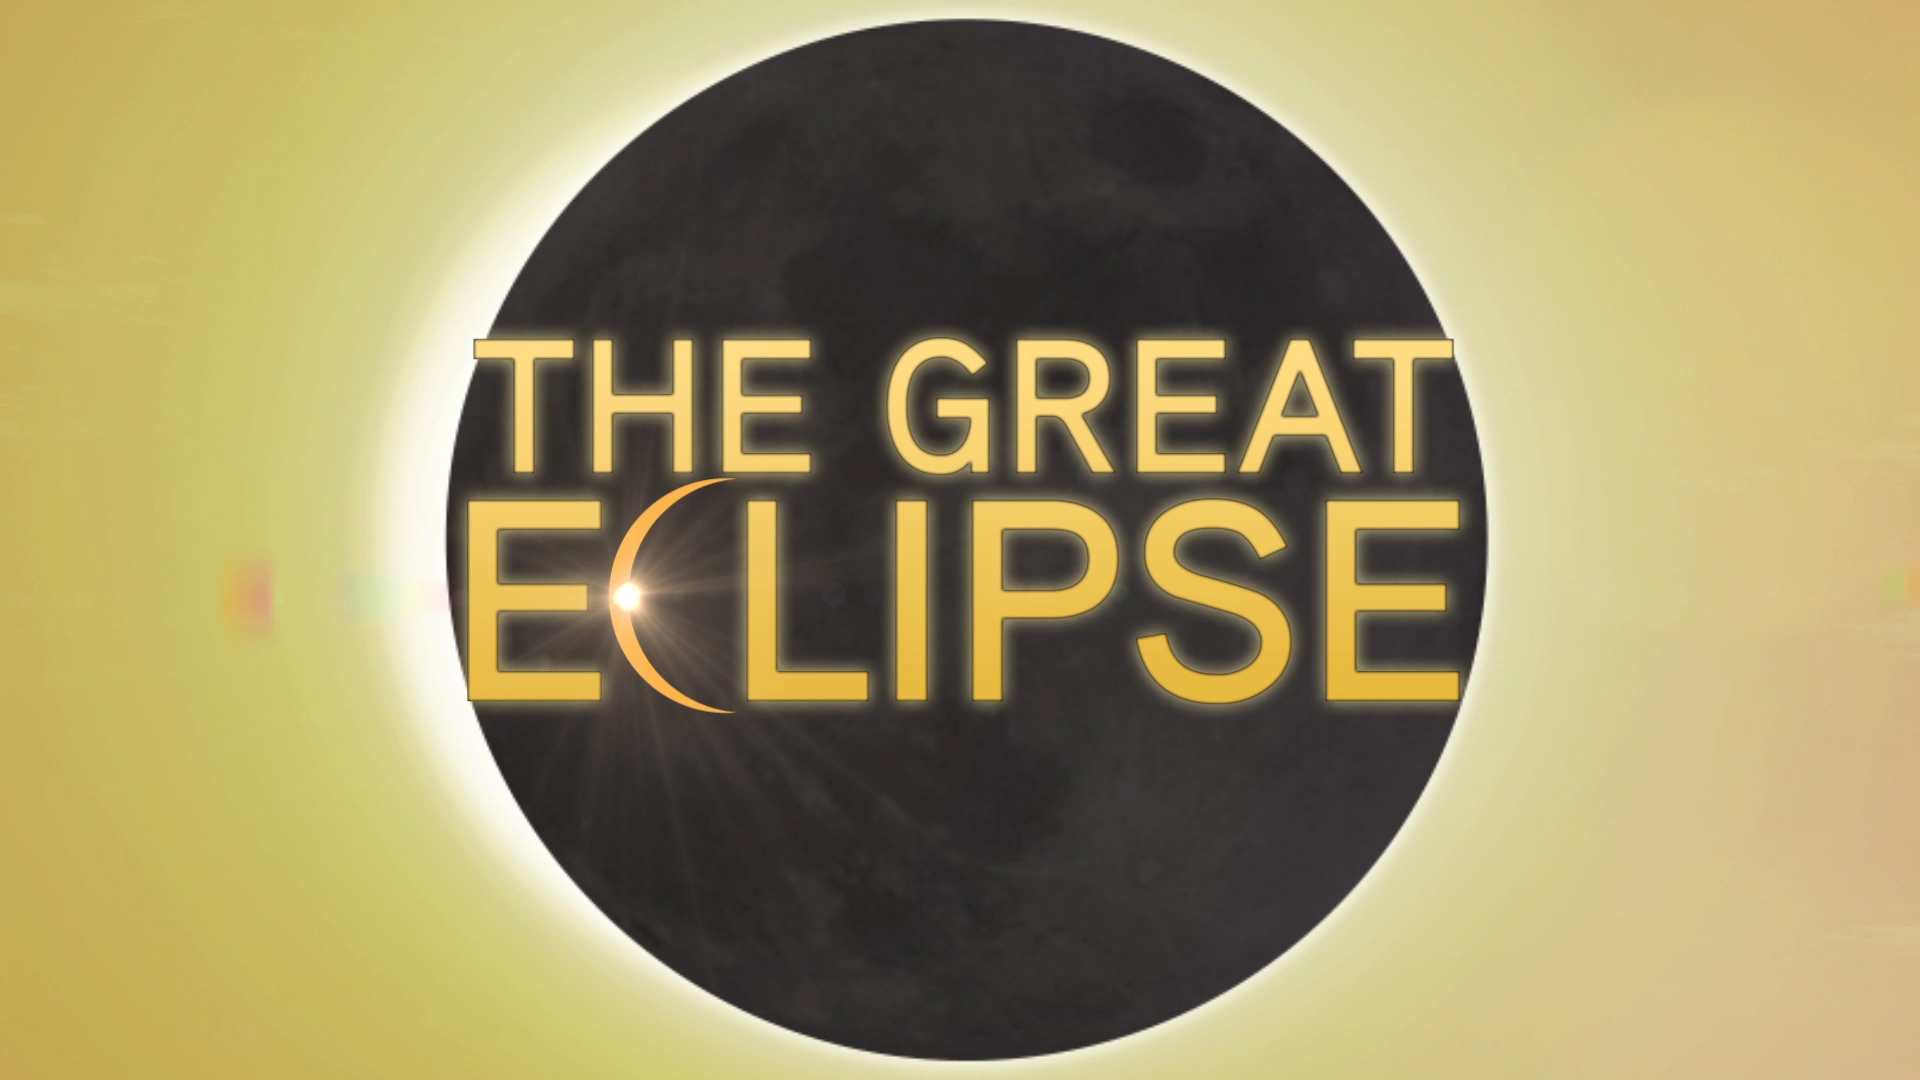 TheGreatEclipseSocial_1501517969403.jpg